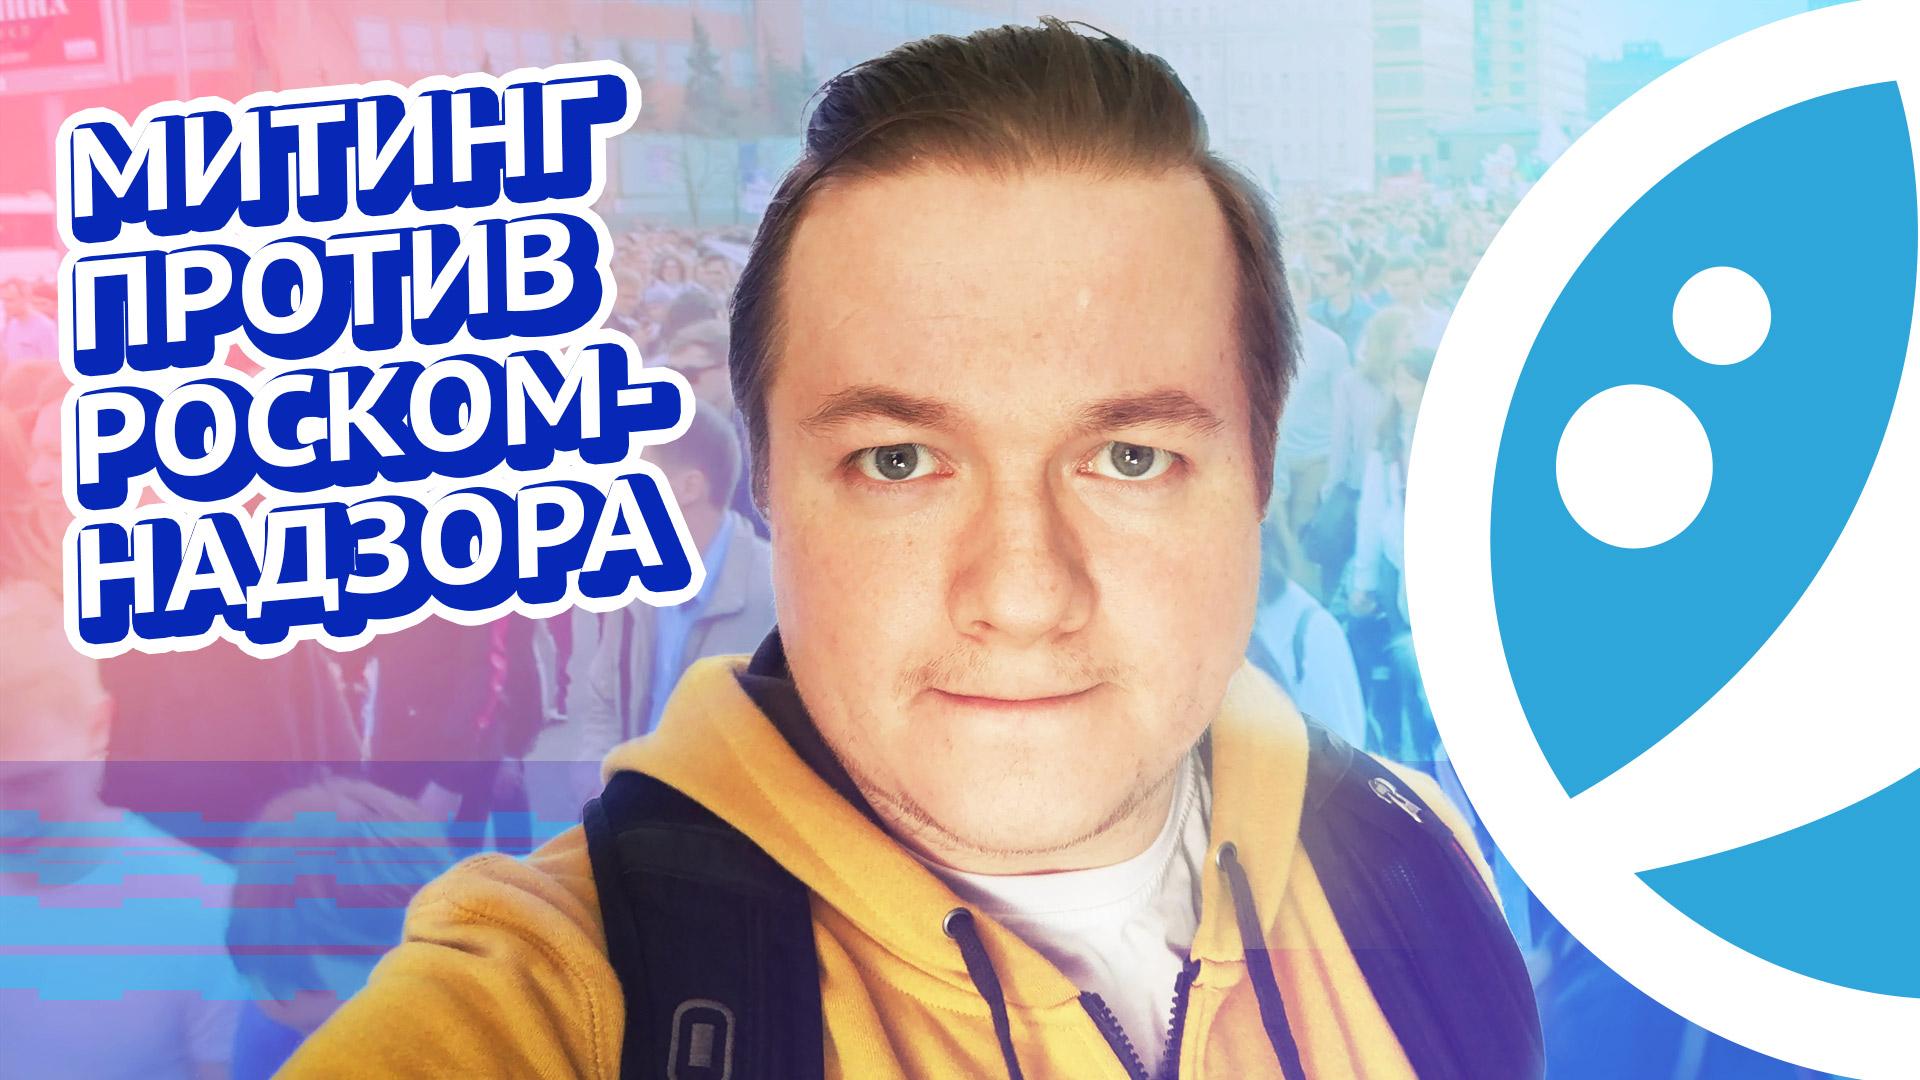 Текст про блокировку интернета и телеграма Роскомнадзором